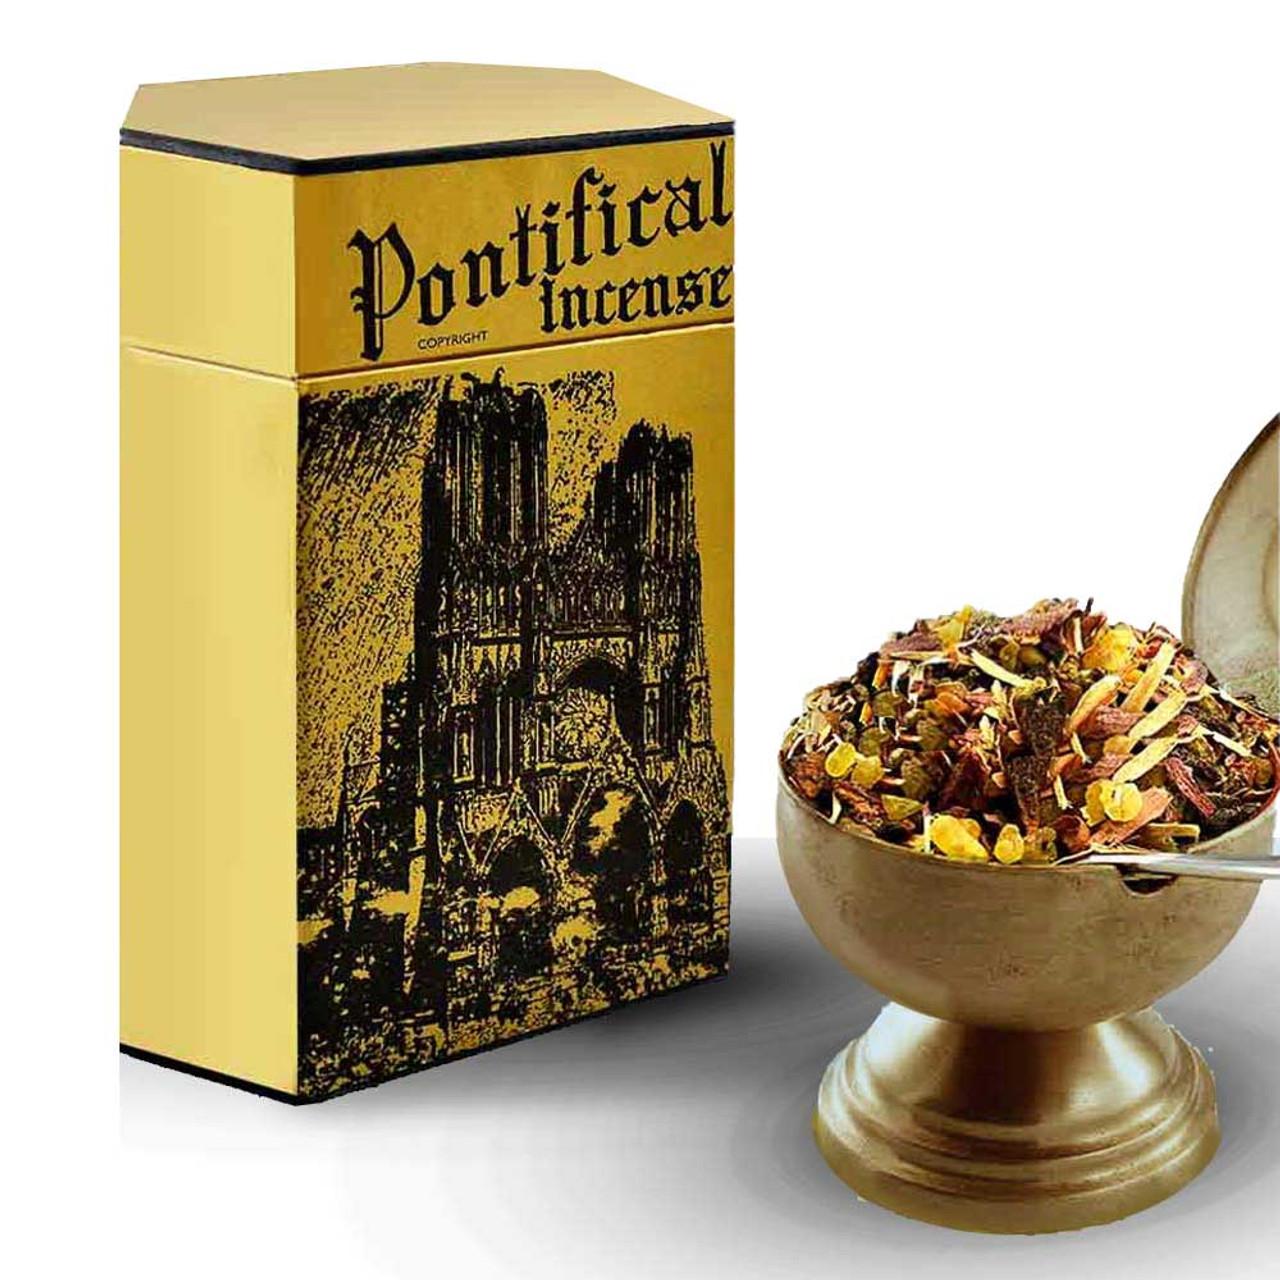 Pontifical Incense 1LB